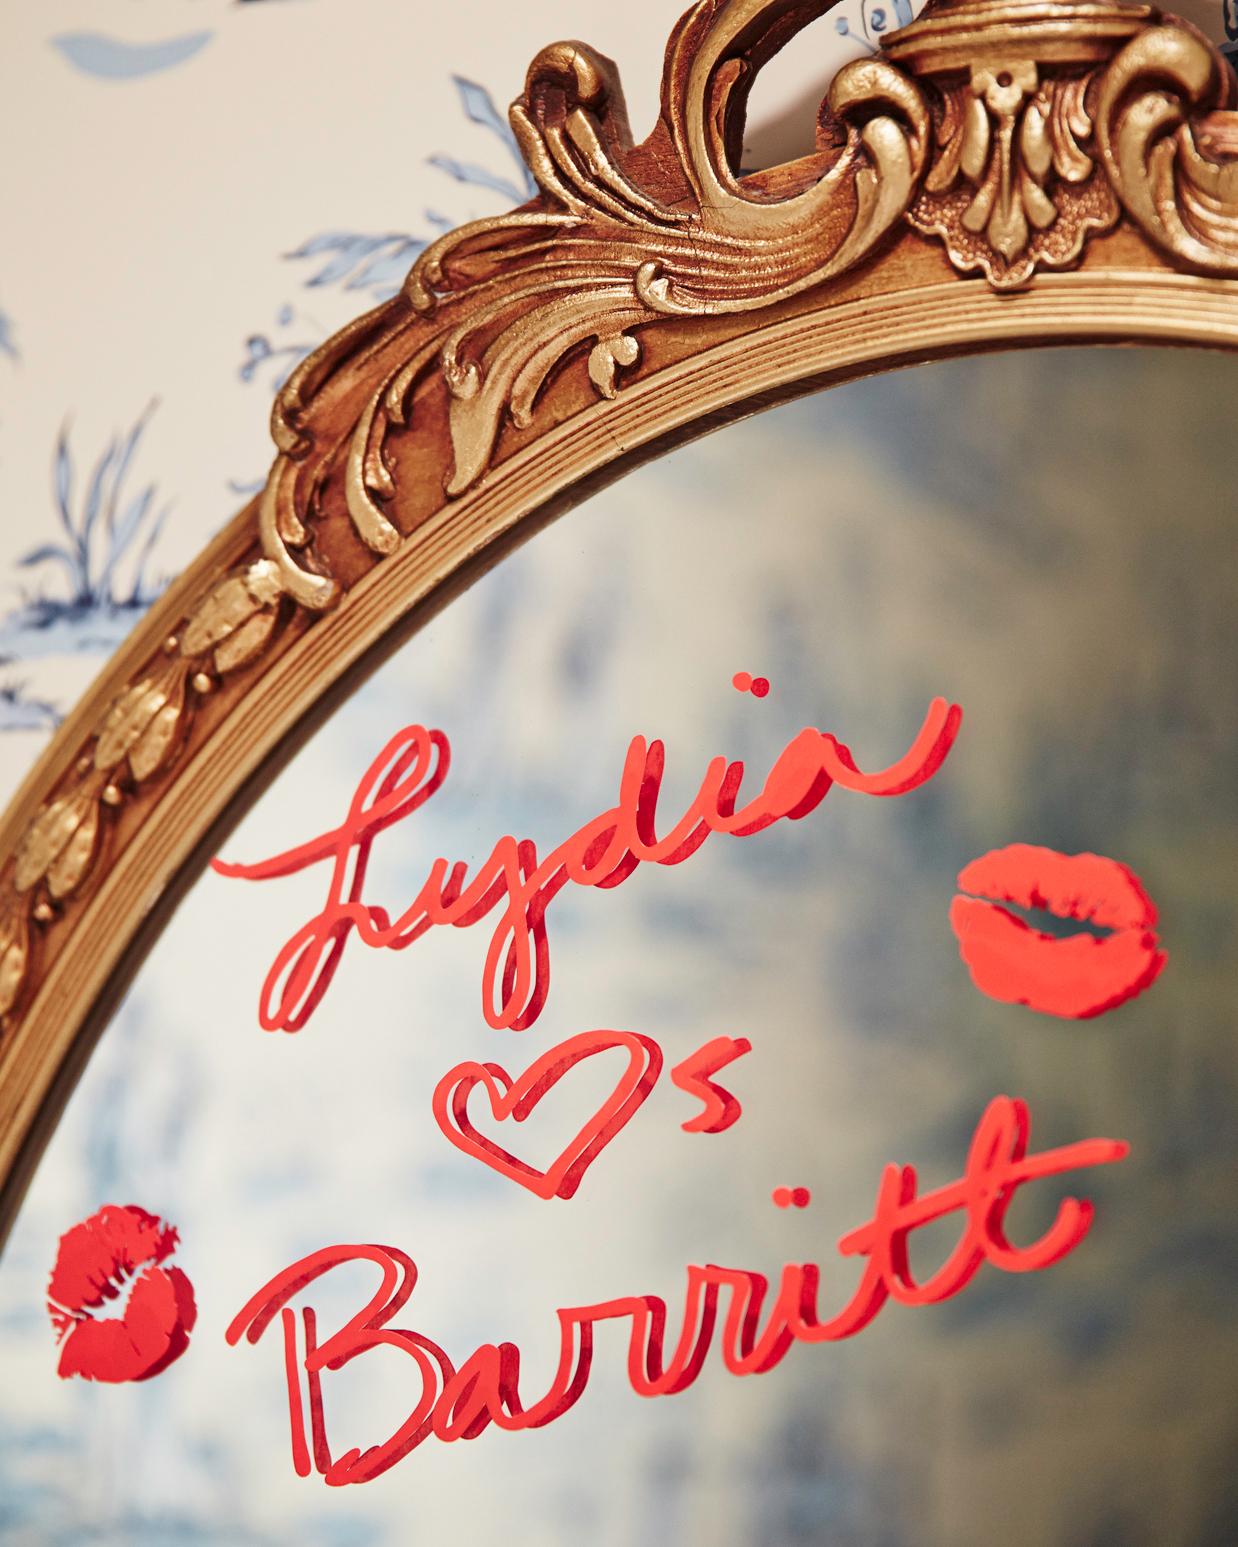 lydia-barritt-wedding-mirror-0414.jpg